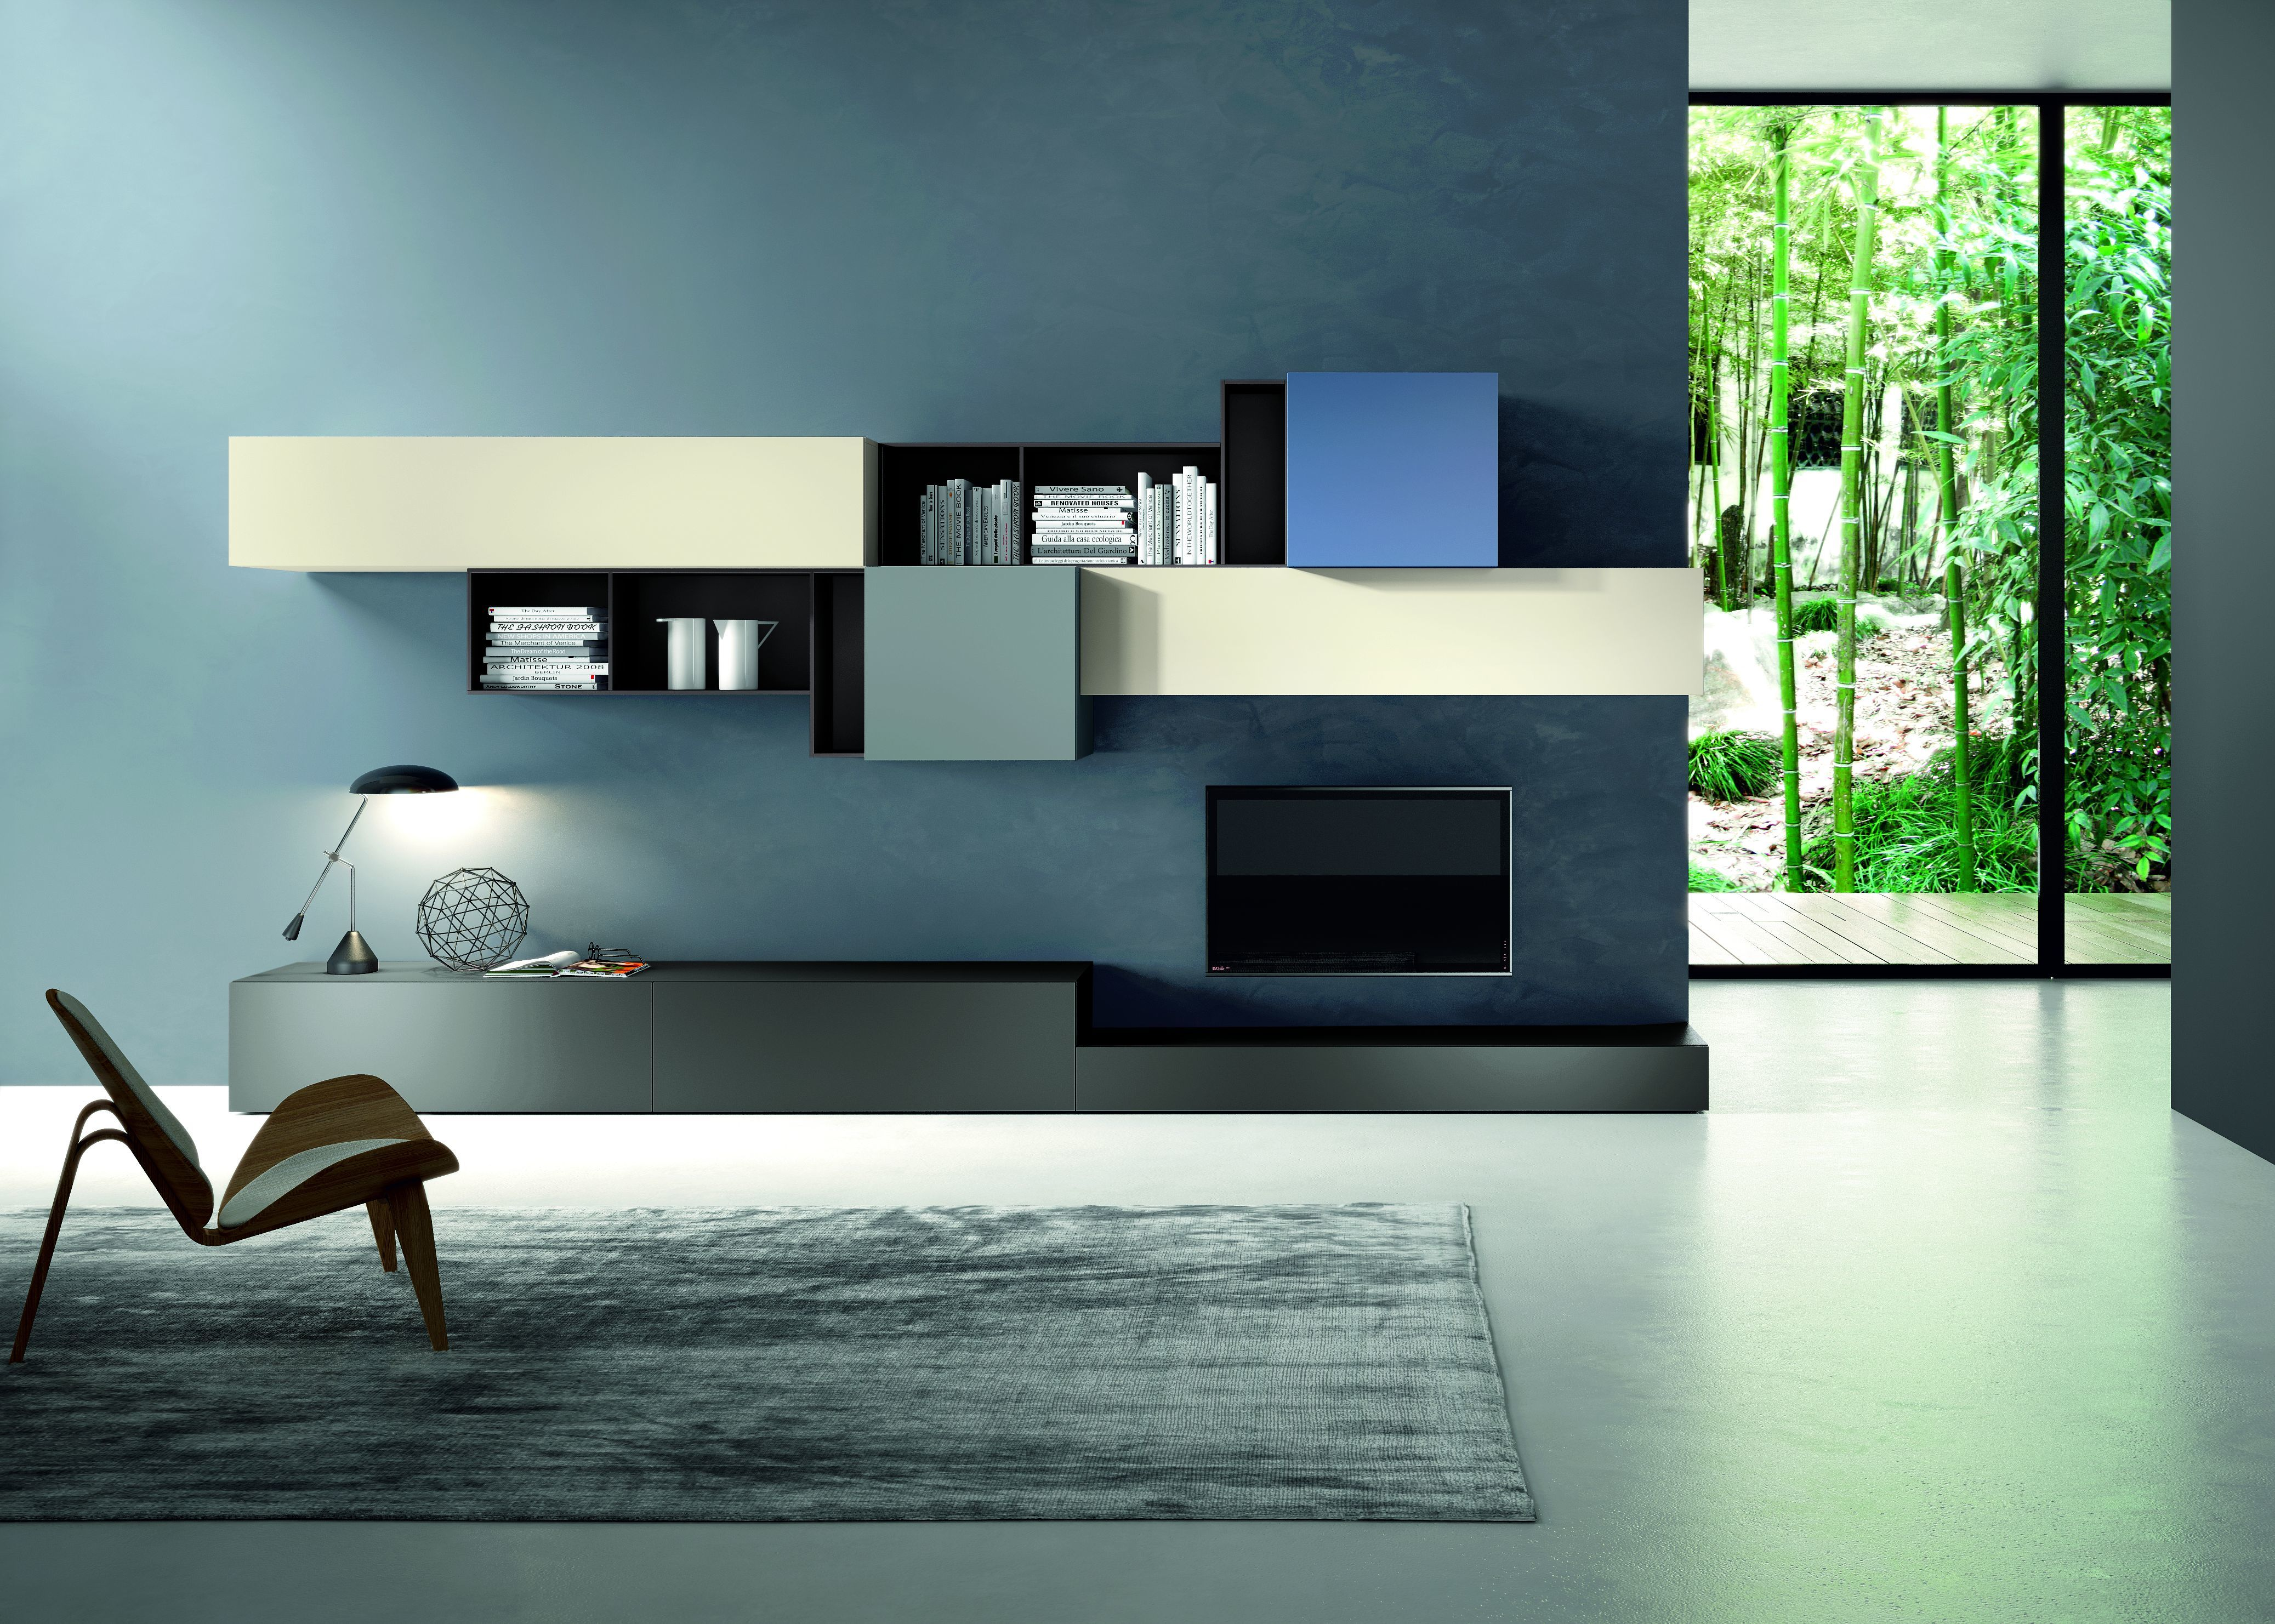 interior-kitchen-furniture-dining-room-living-room-modern-contemporary-furniture-mid-century-modern-